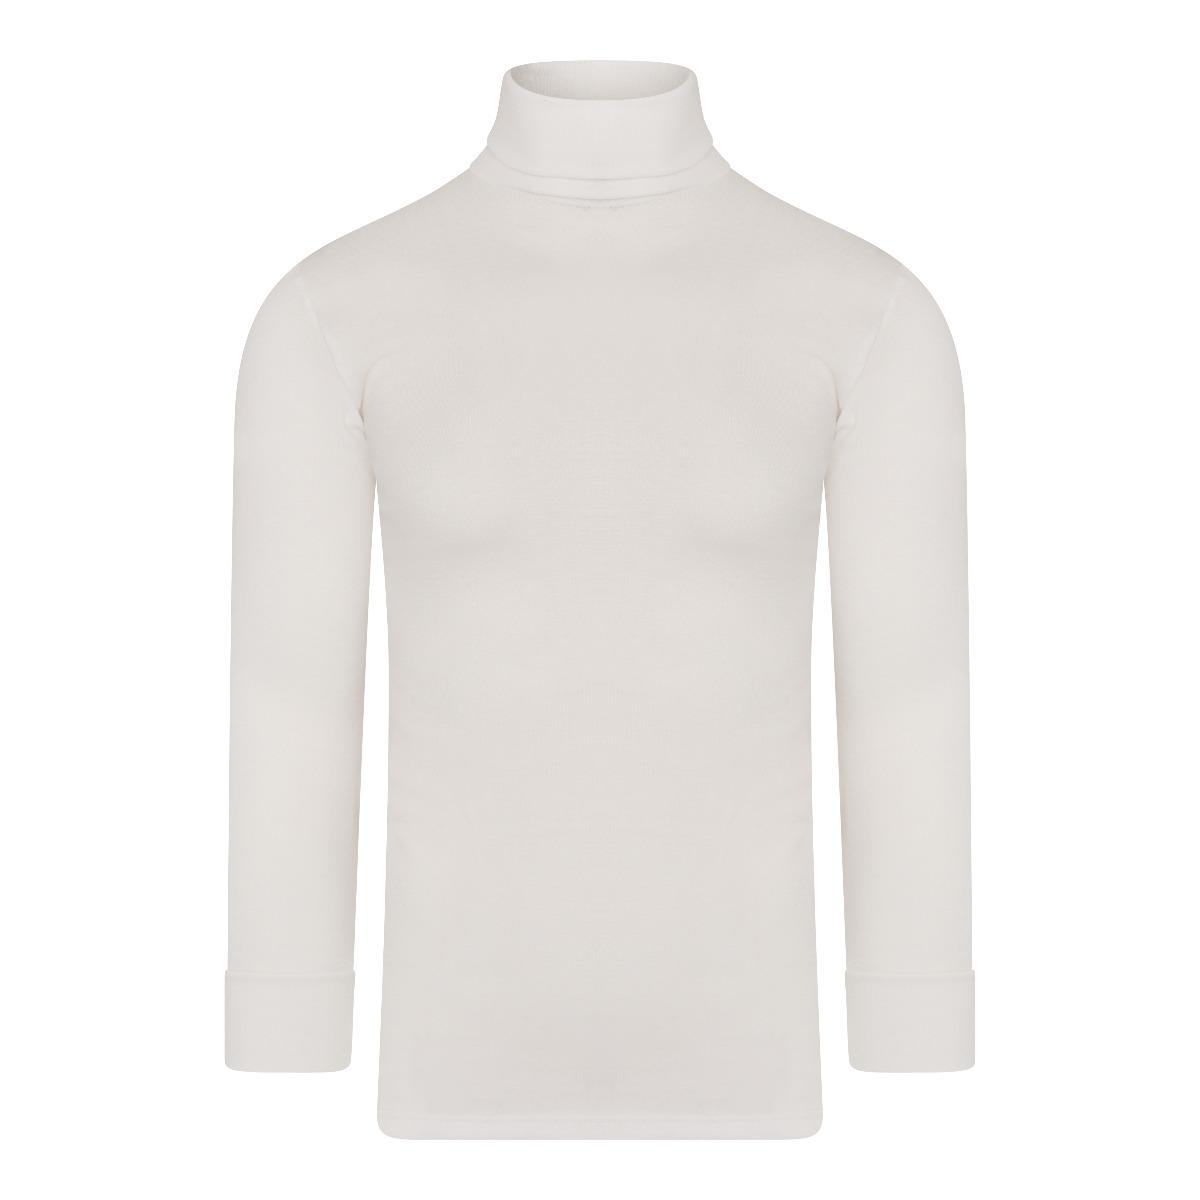 Beeren Thermo Unisex Shirt Col Lange Mouw Wolwit Xxl